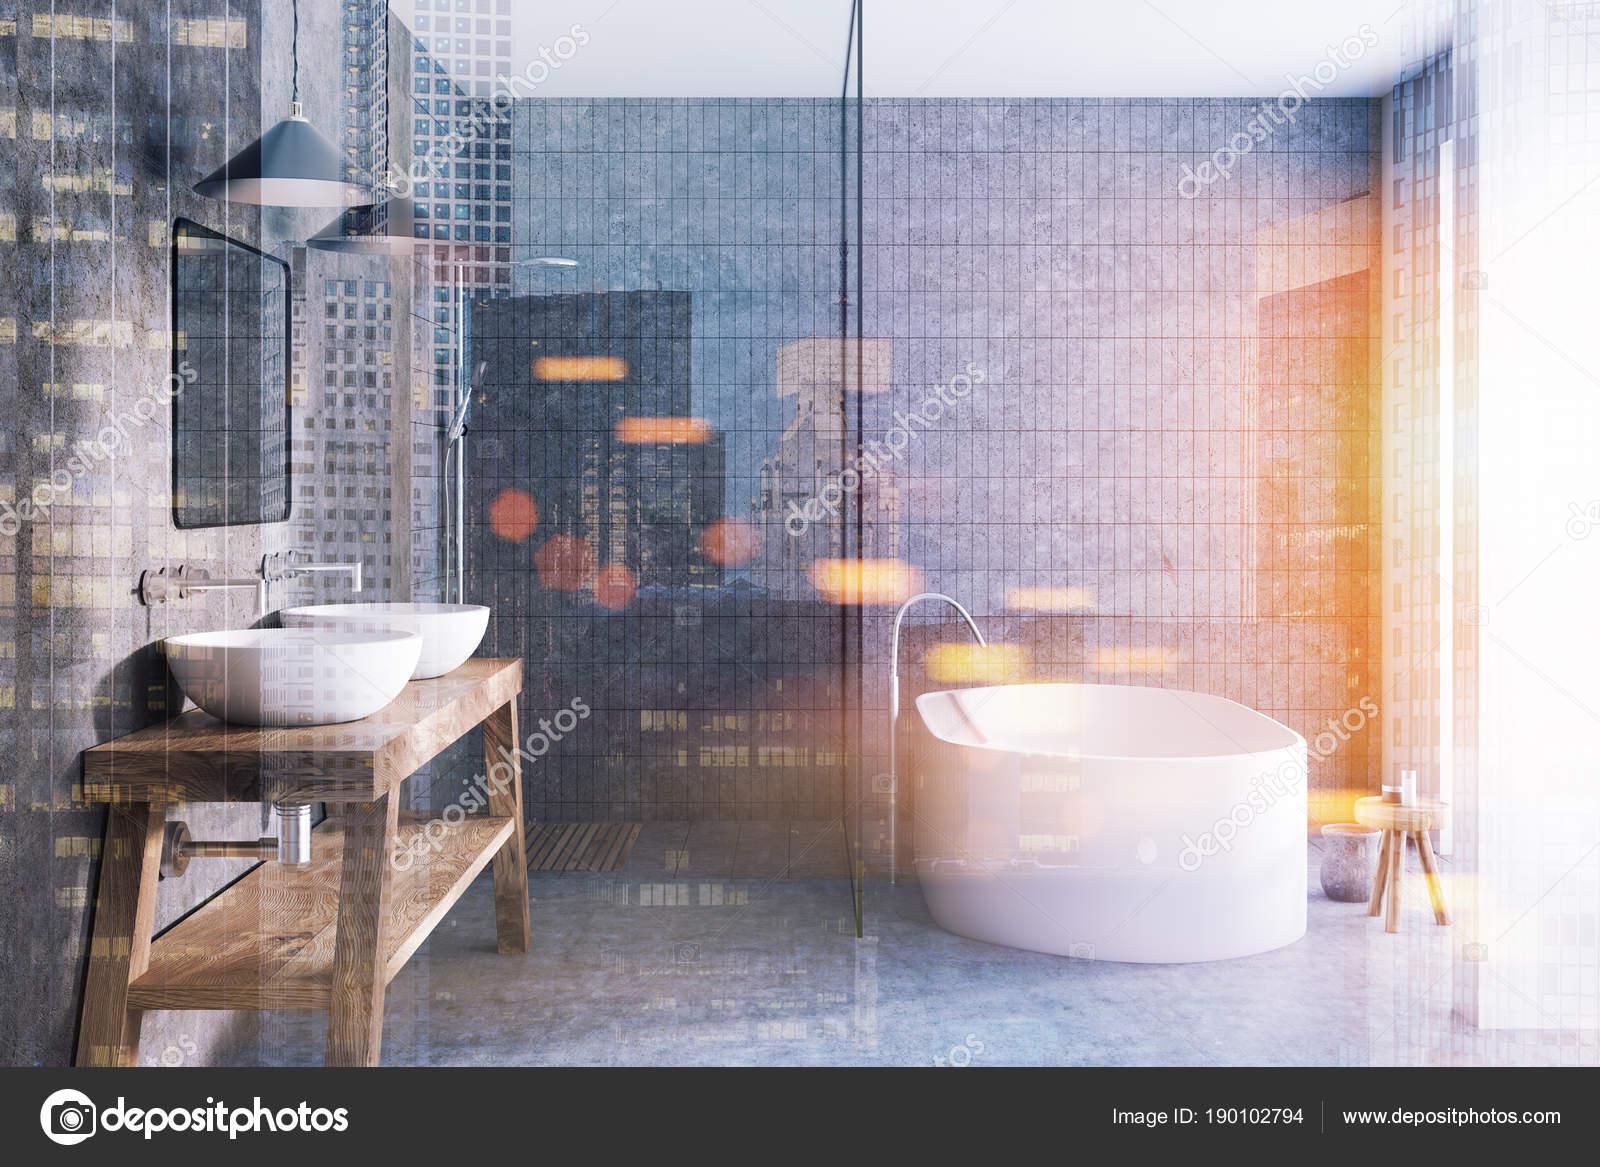 Hellgrauen Fliesen Badezimmer Interieur Getont Stockfoto